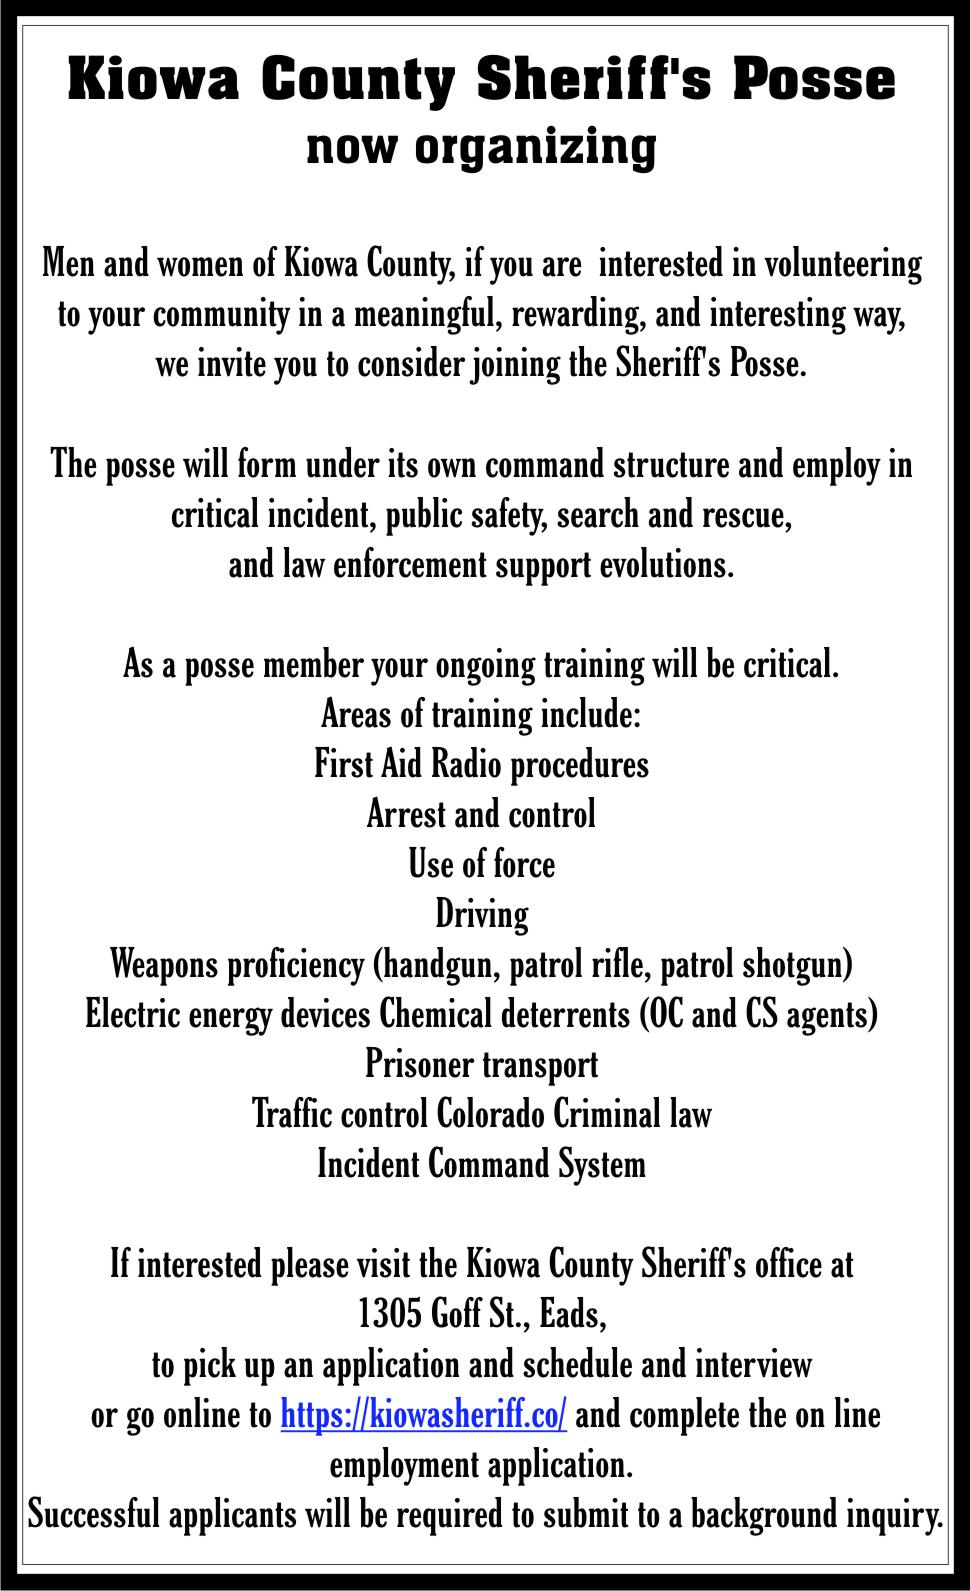 AD 2021-10 Kiowa County Sheriff's Posse